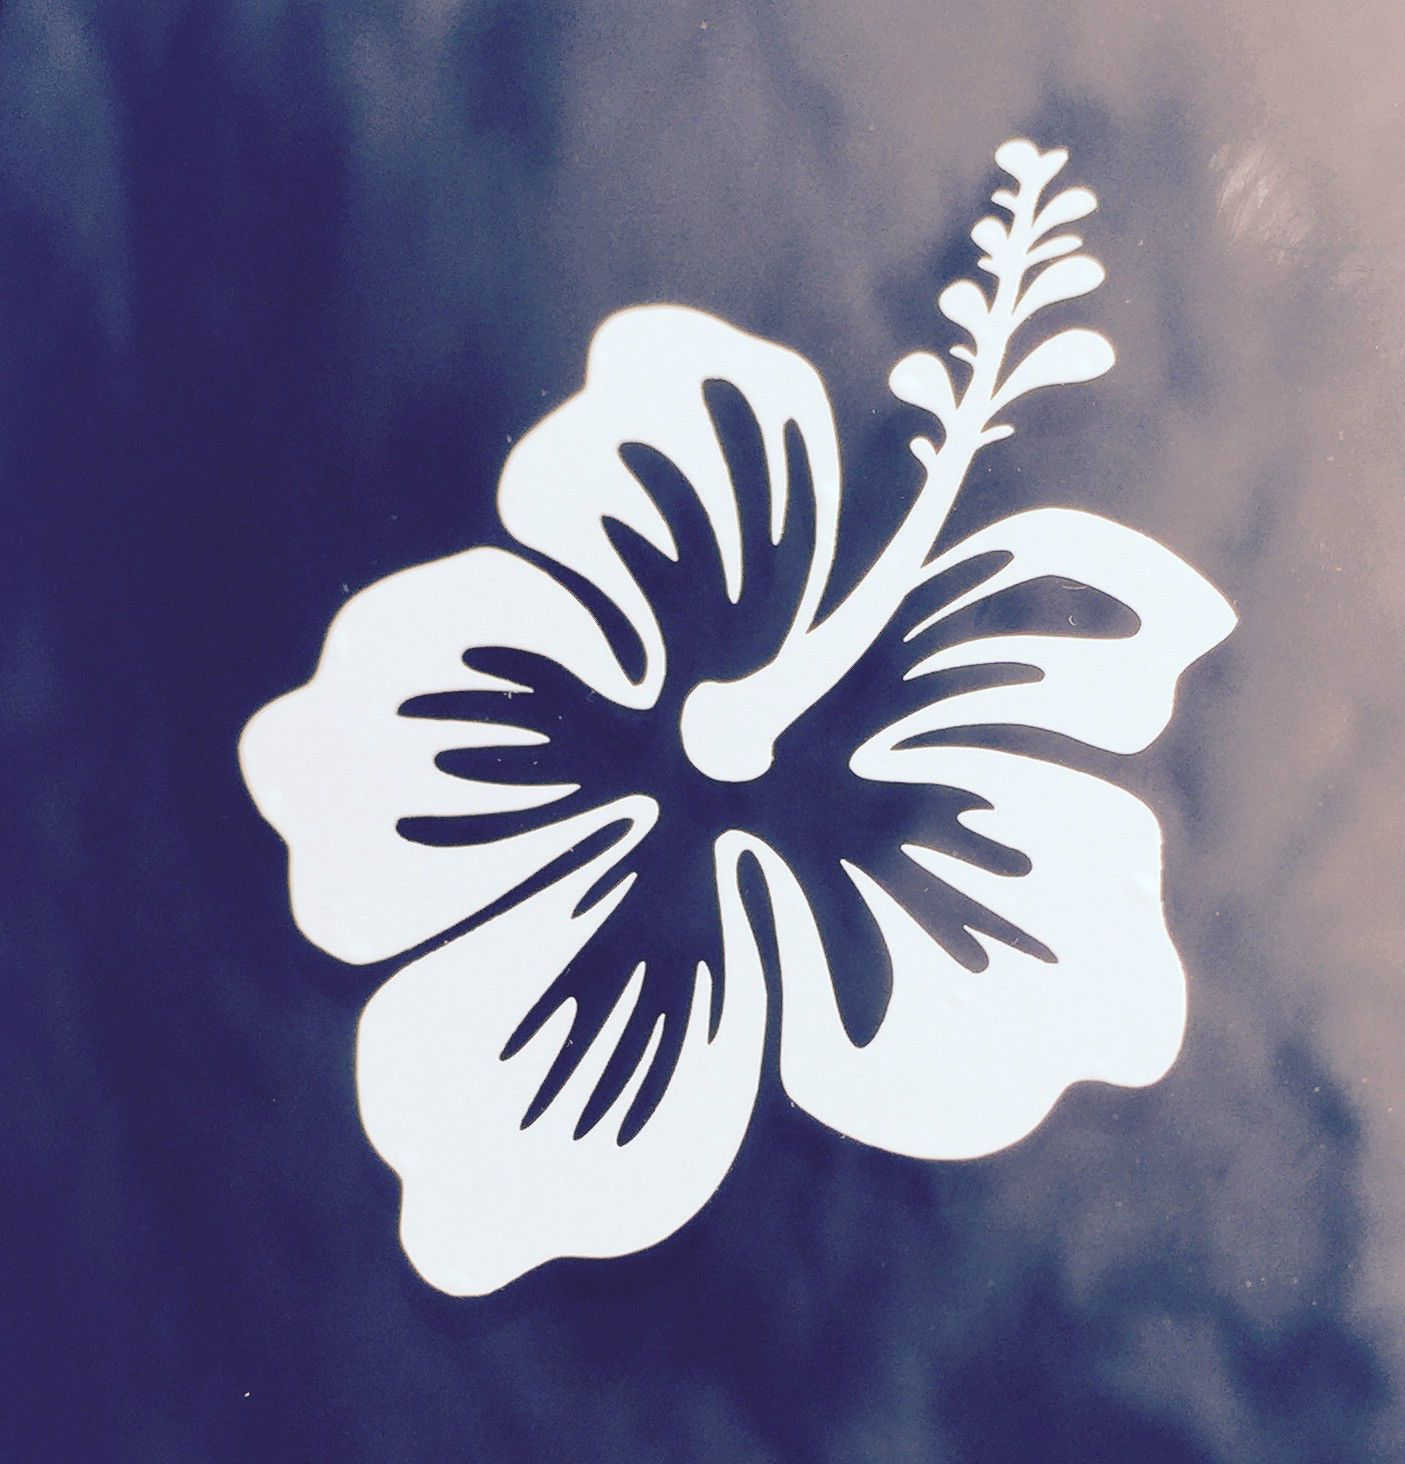 Hawaii Hawaiian Islands Hibiscus Flower 2 Vinyl Decal Car Bumper Sticker White Hawaiian Tattoo Car Decals Vinyl Hawaiian Art [ 1464 x 1405 Pixel ]